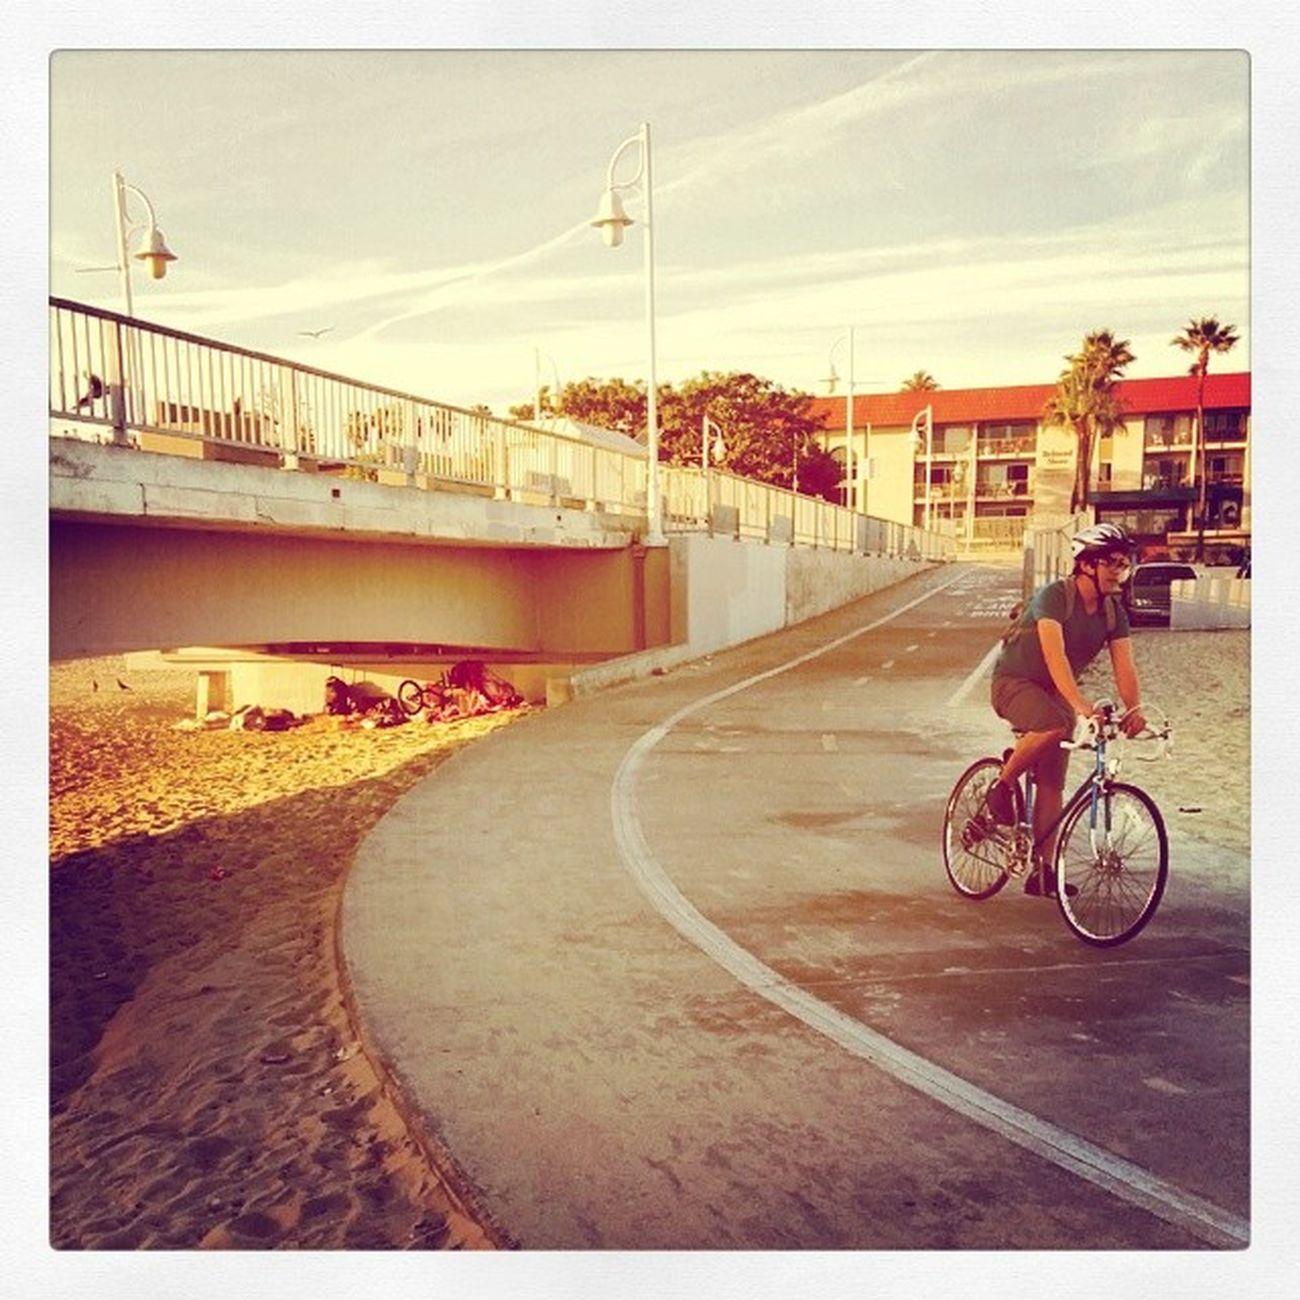 Humansofcalifornia Humansoftehran Humansoflongbeach Biking